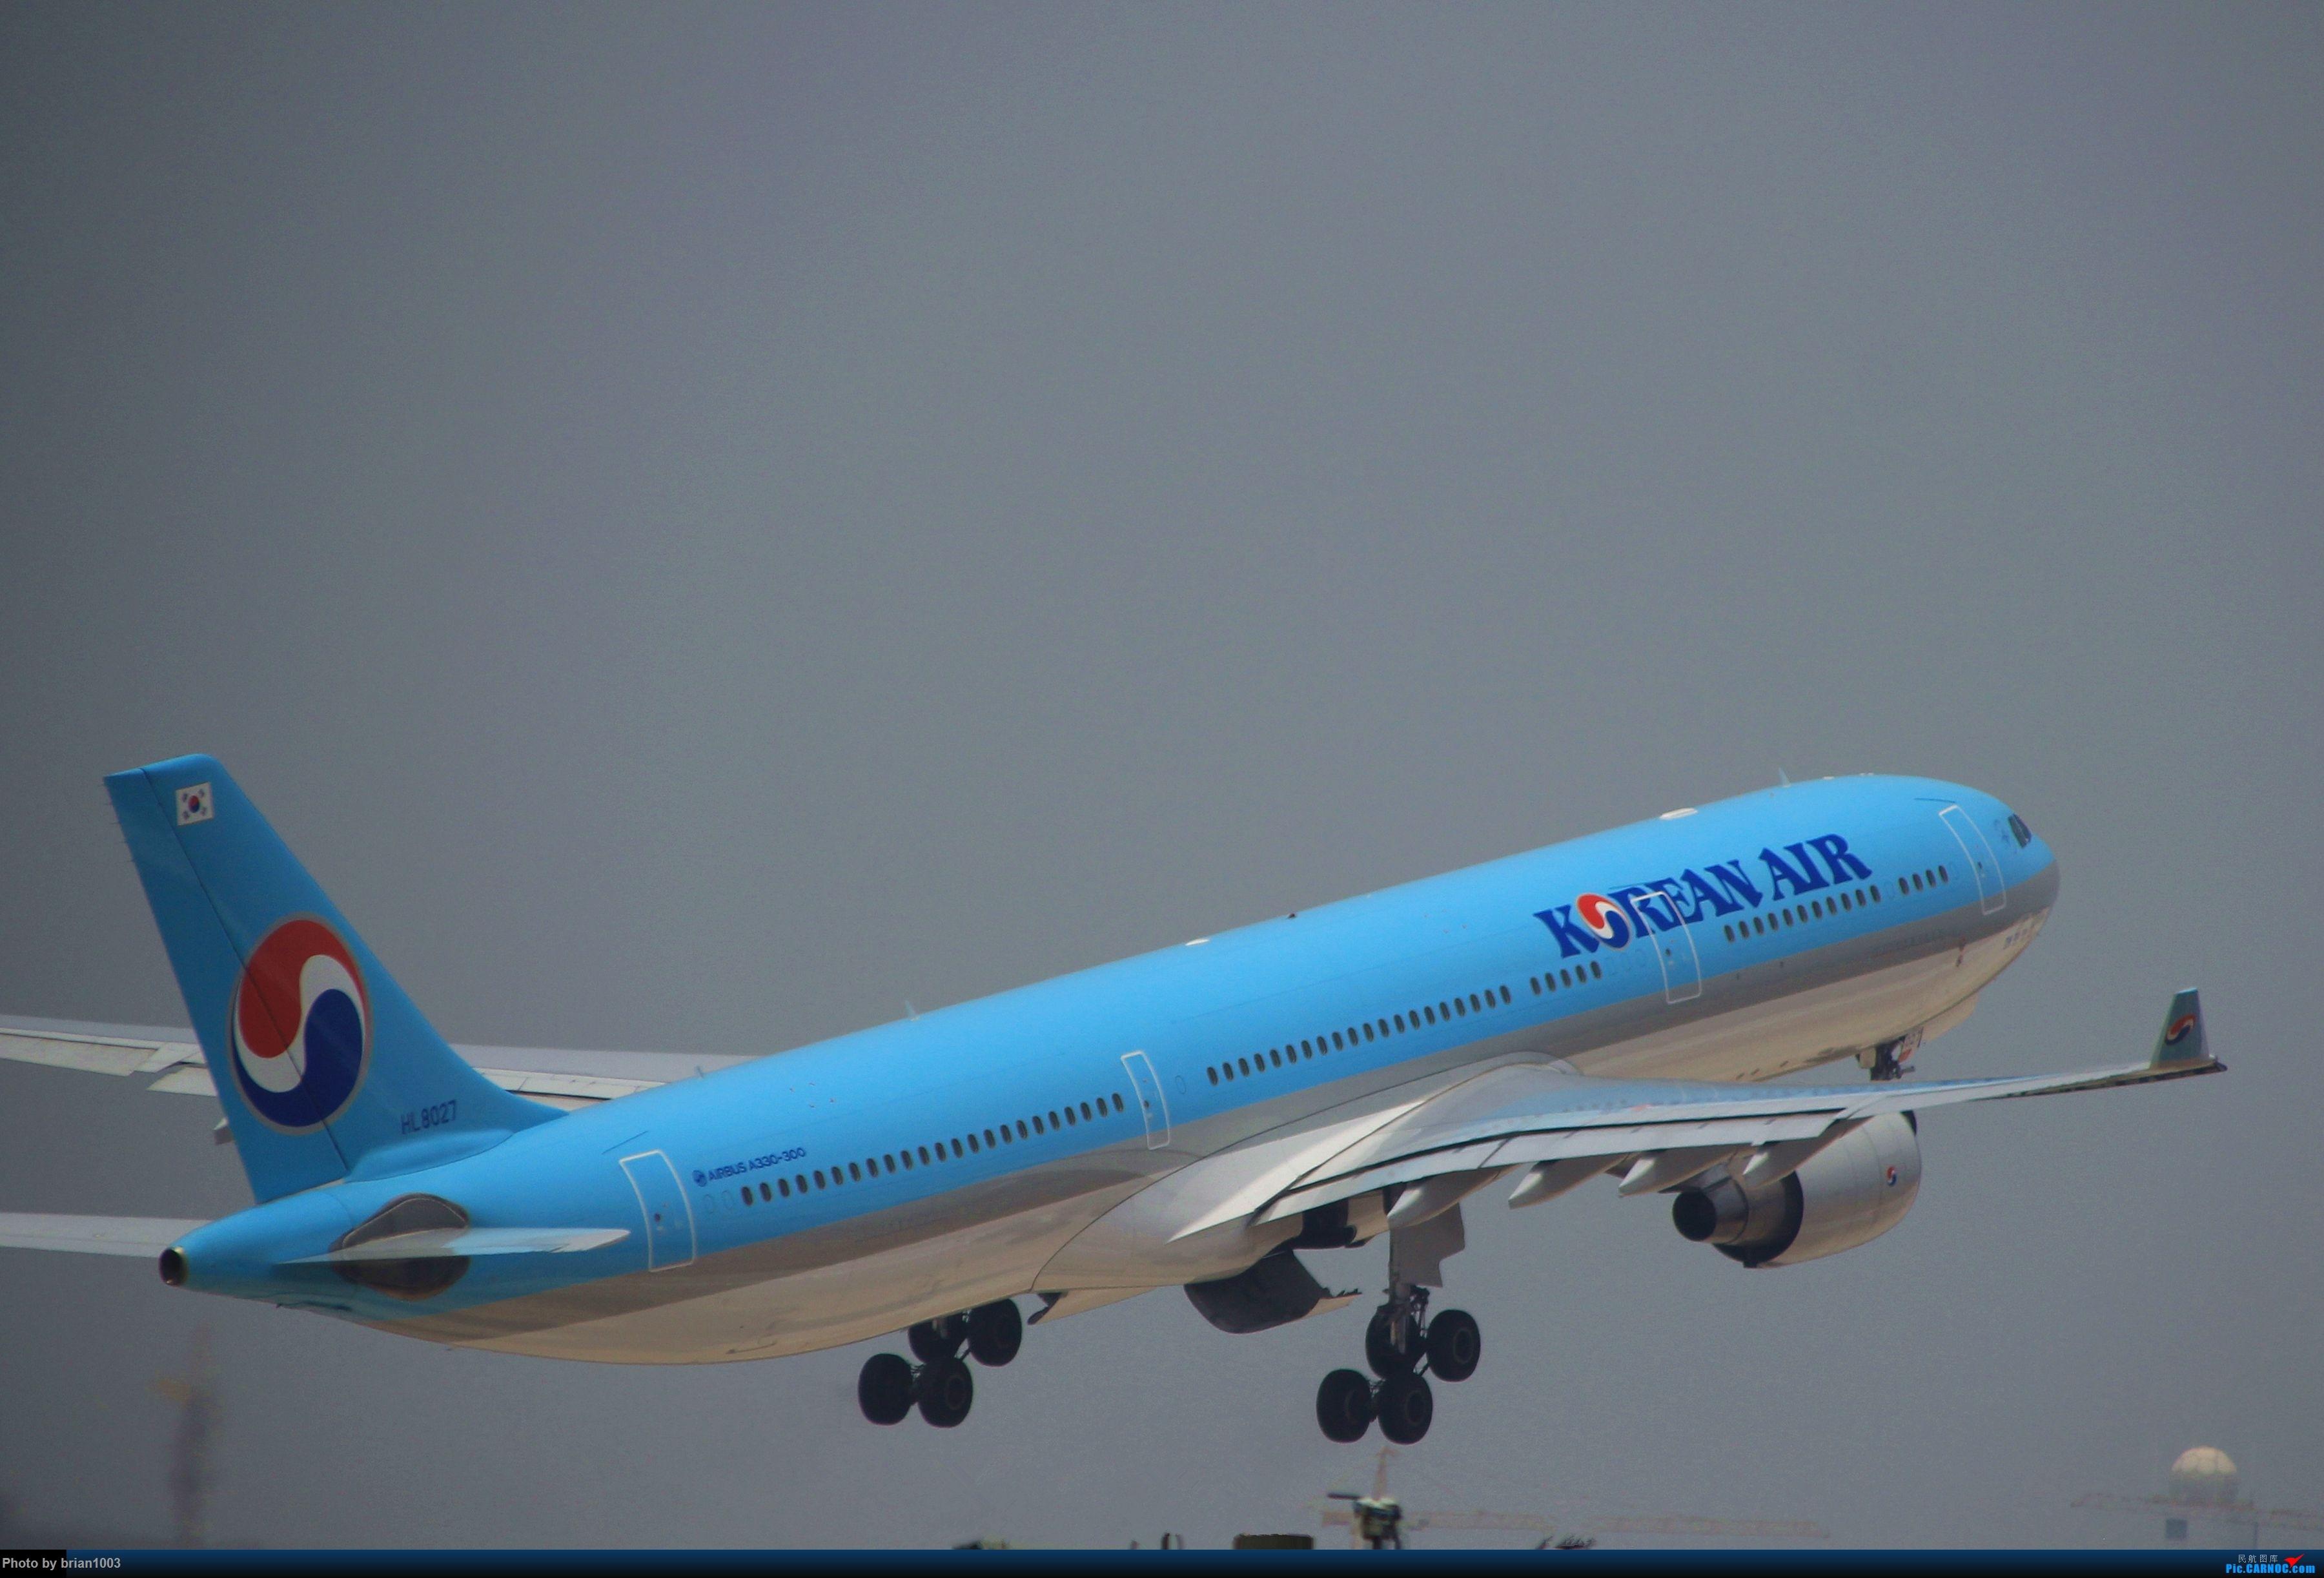 Re:[原创]WUH武汉天河机场拍机之二跑最后忙碌时 AIRBUS A330-300 HL8027 中国武汉天河国际机场